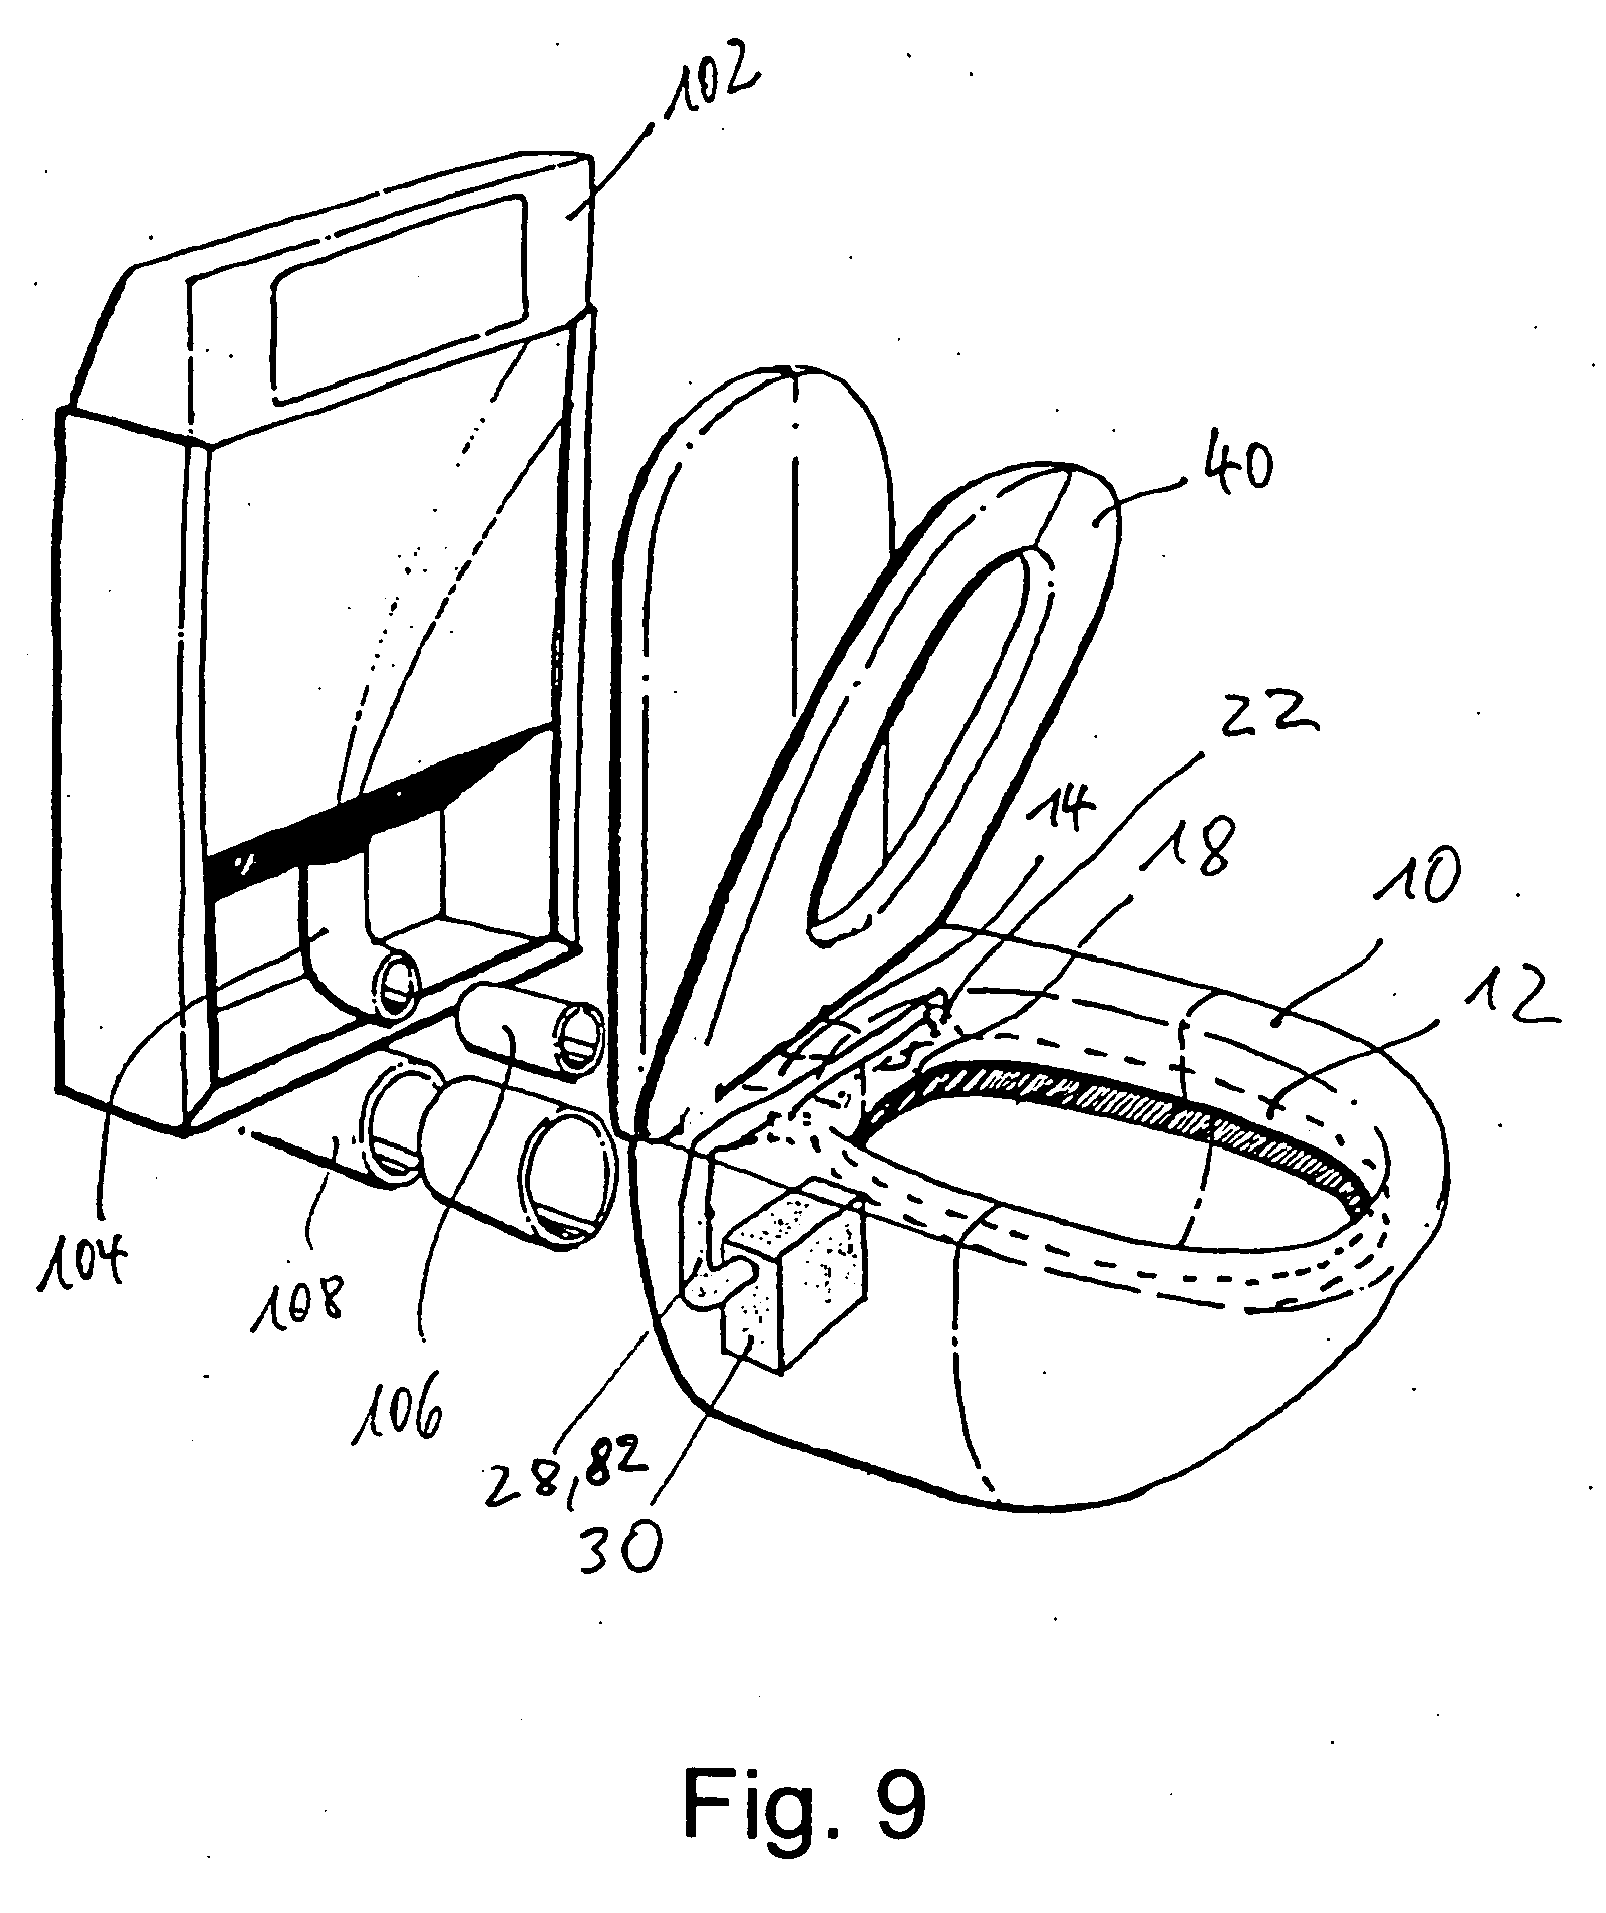 patent ep1621690b1 wc mit geruchsabsaugung google patents. Black Bedroom Furniture Sets. Home Design Ideas